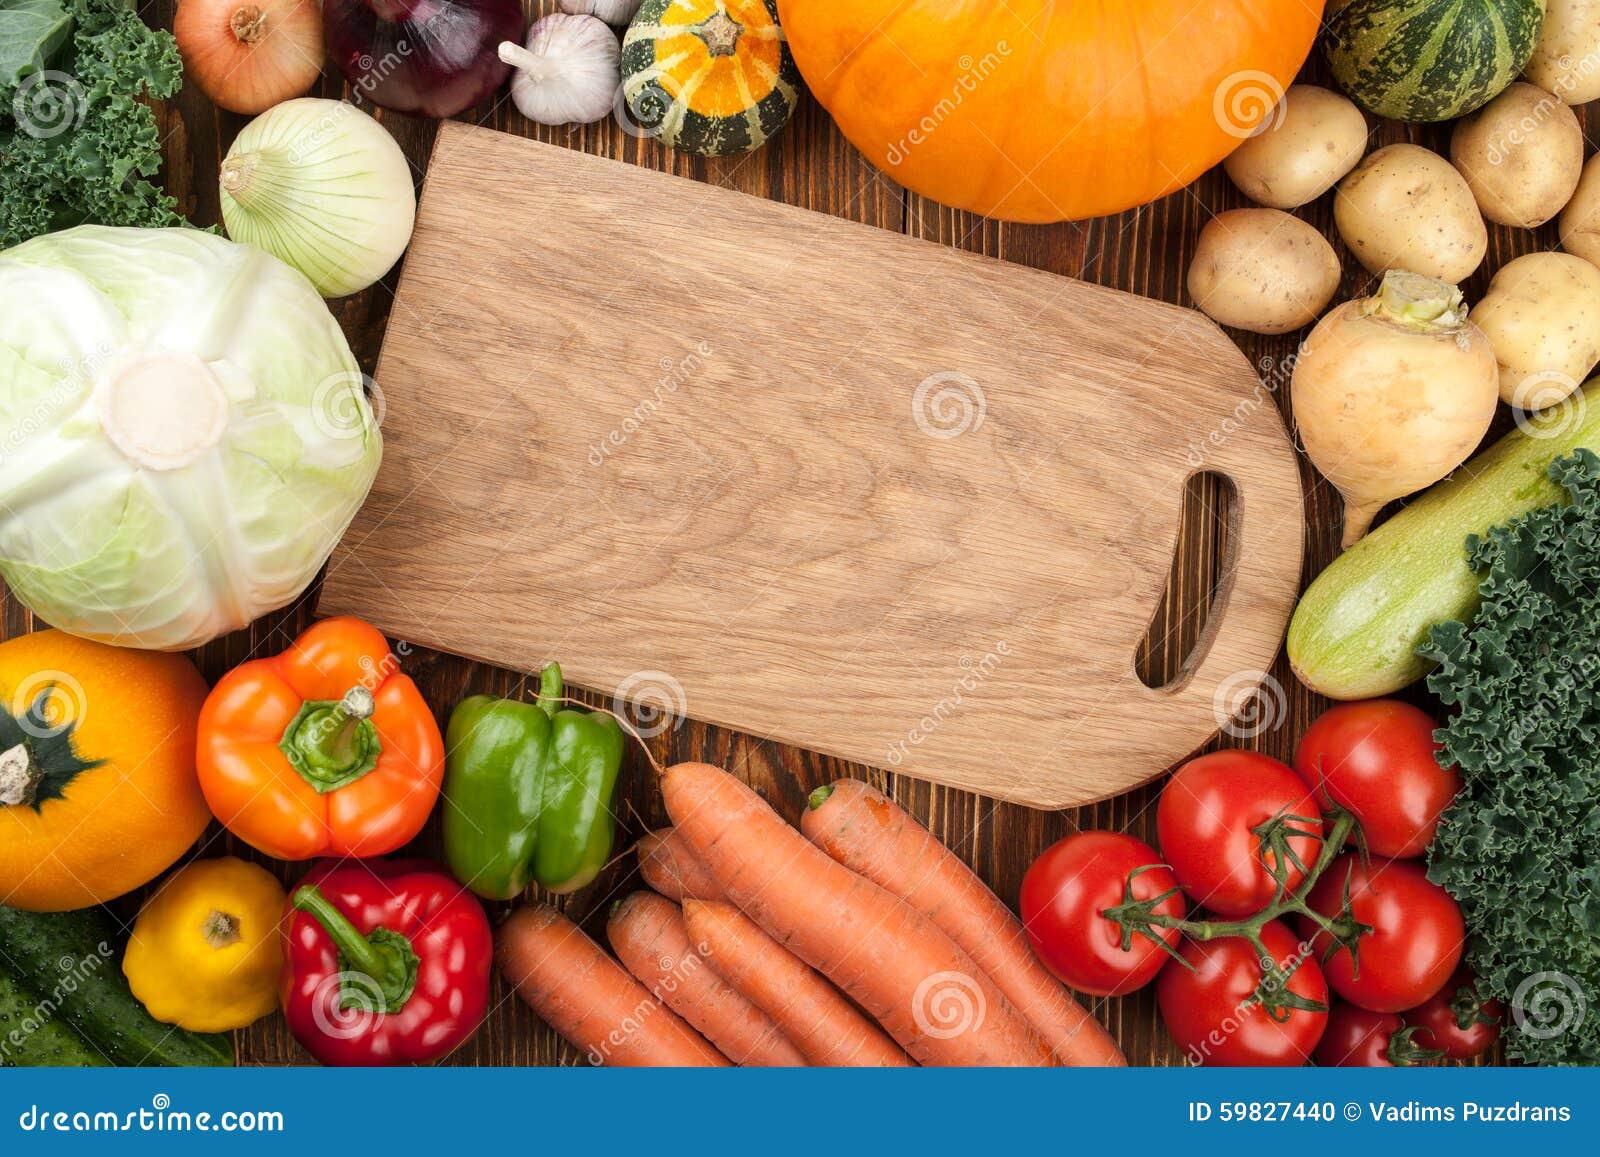 Organic Plant Food Orange Box